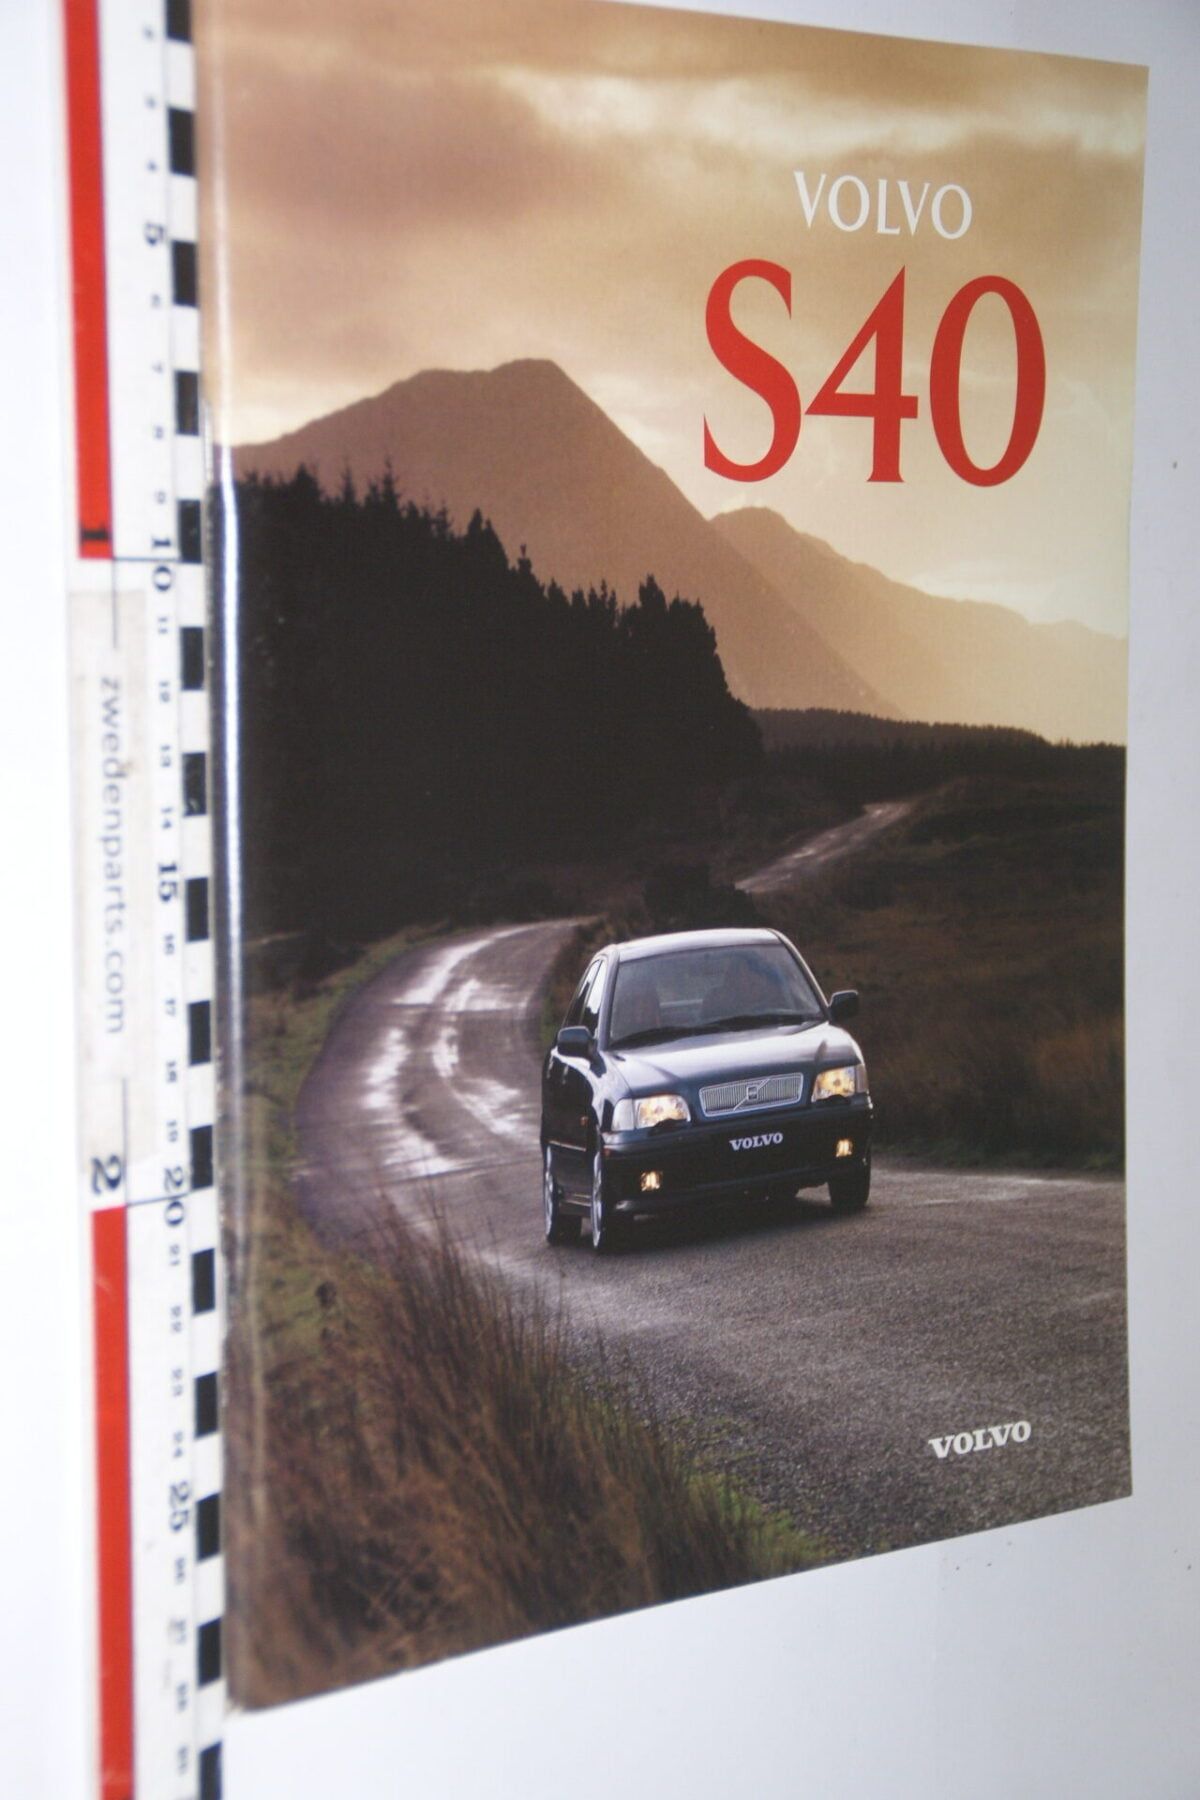 DSC05004 1996 originele brochure nr. MSPV 8050-96 Volvo S40 Svenska-95f41252